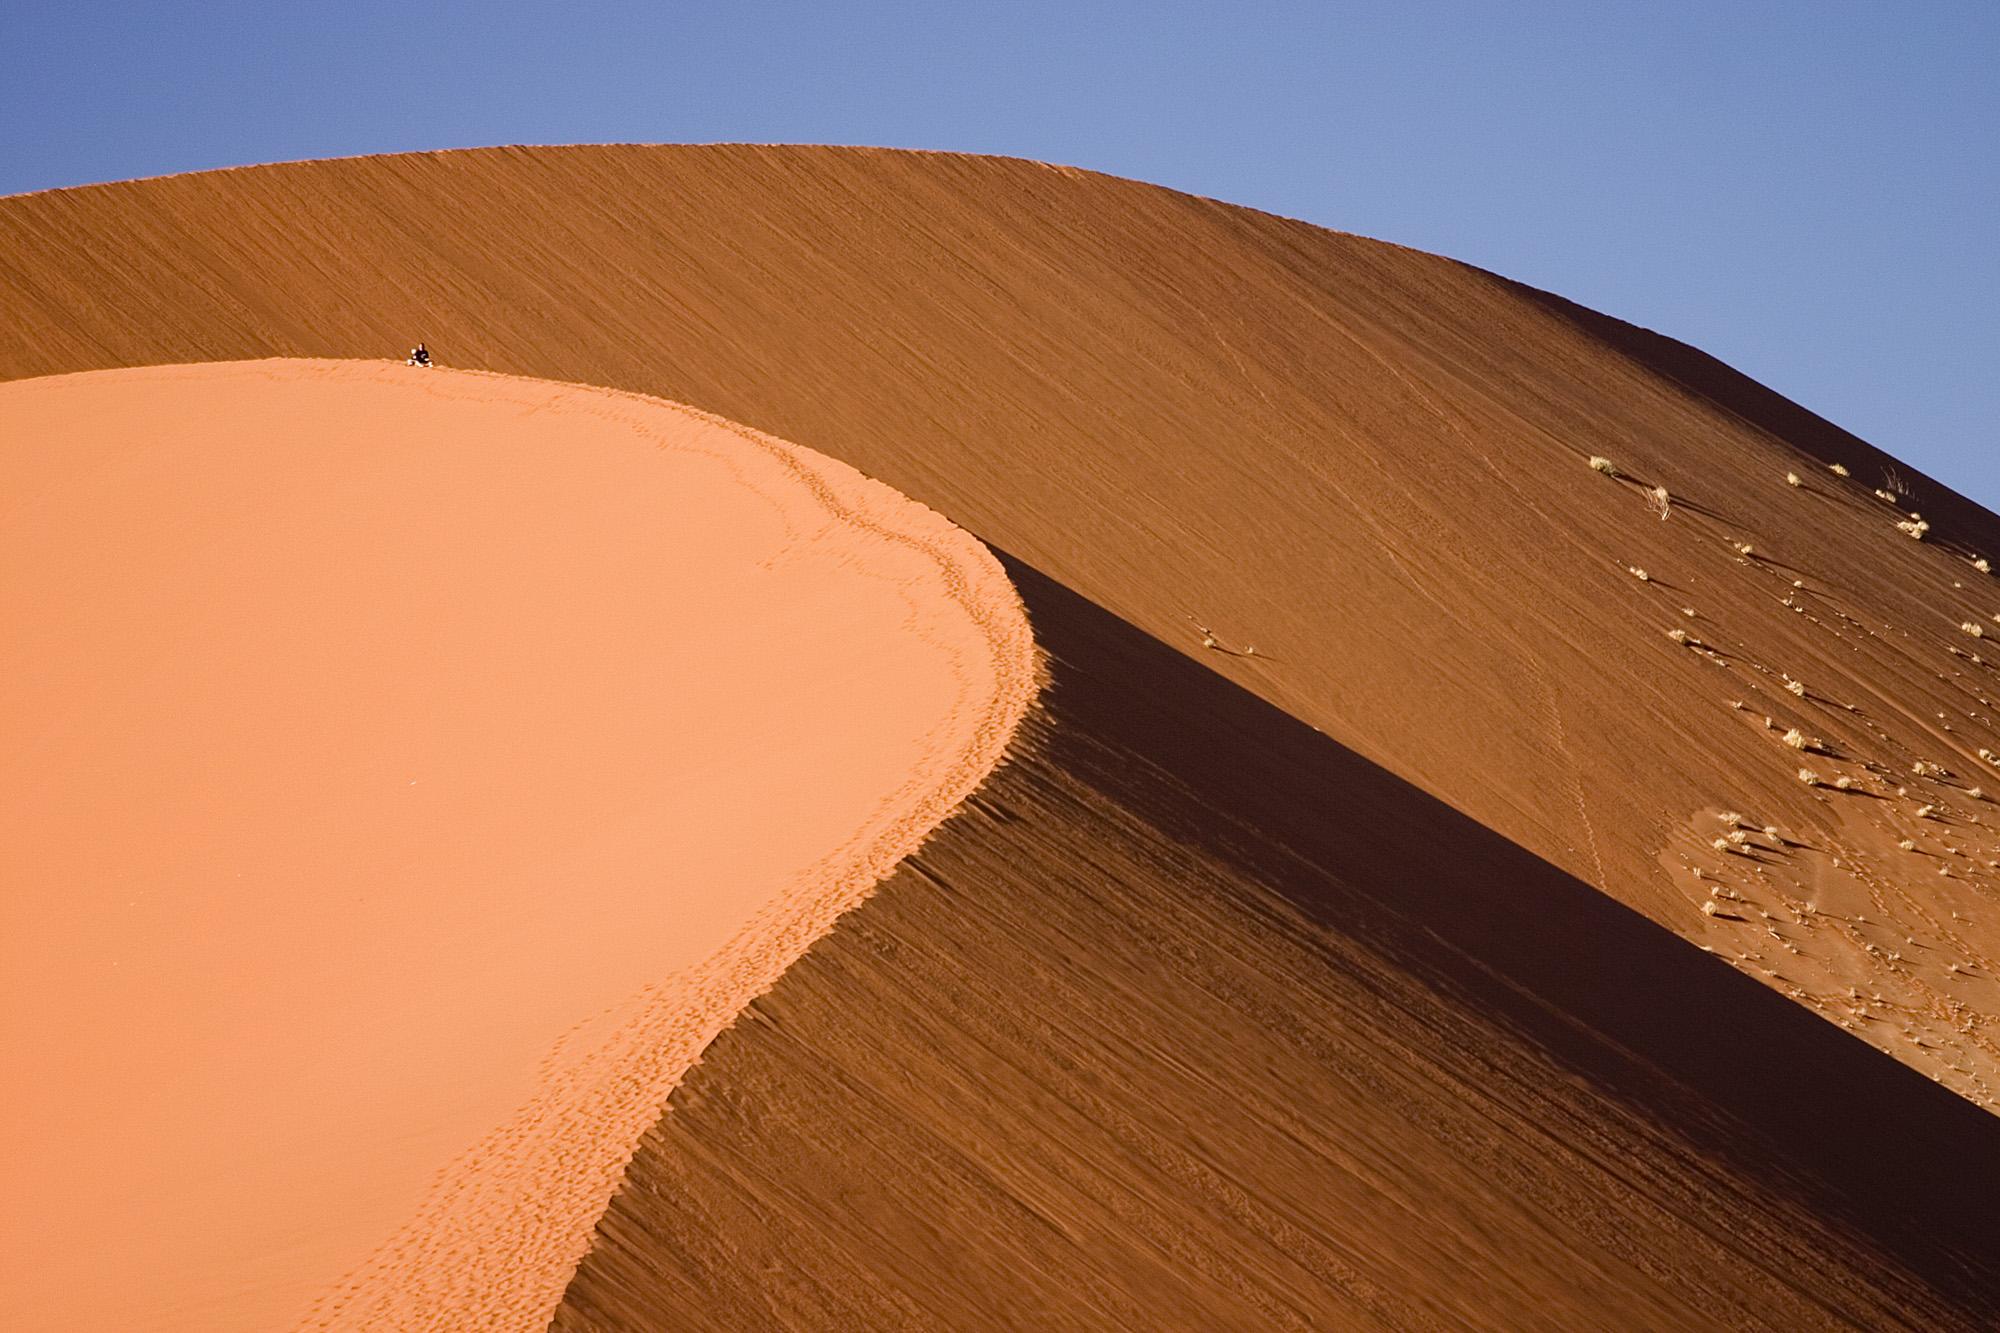 Sossusvlei_Dune_Namib_Desert_Namibia_Luca_Galuzzi_2004.JPG?uselang=zh-cn